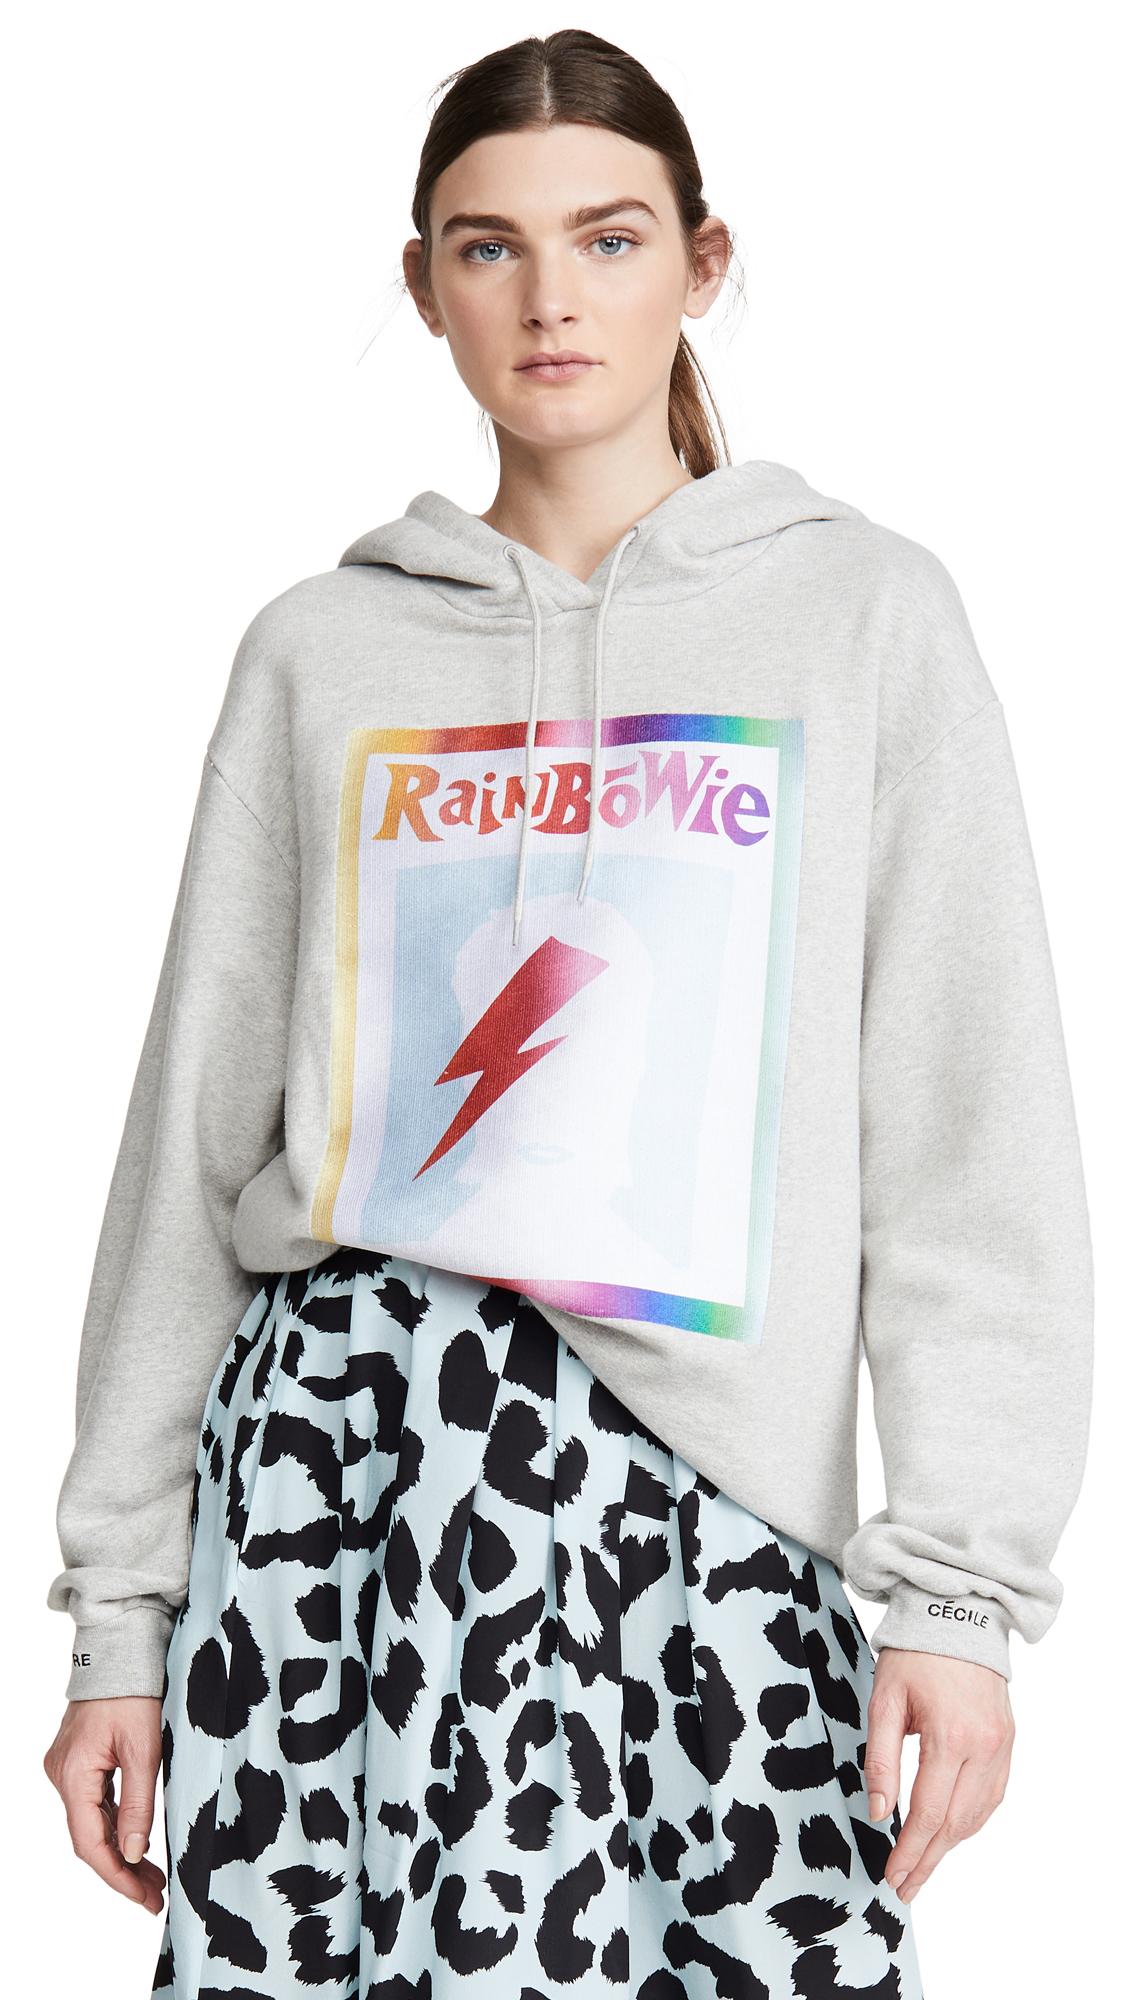 Buy Etre Cecile online - photo of Etre Cecile Rainbowie Sweatshirt